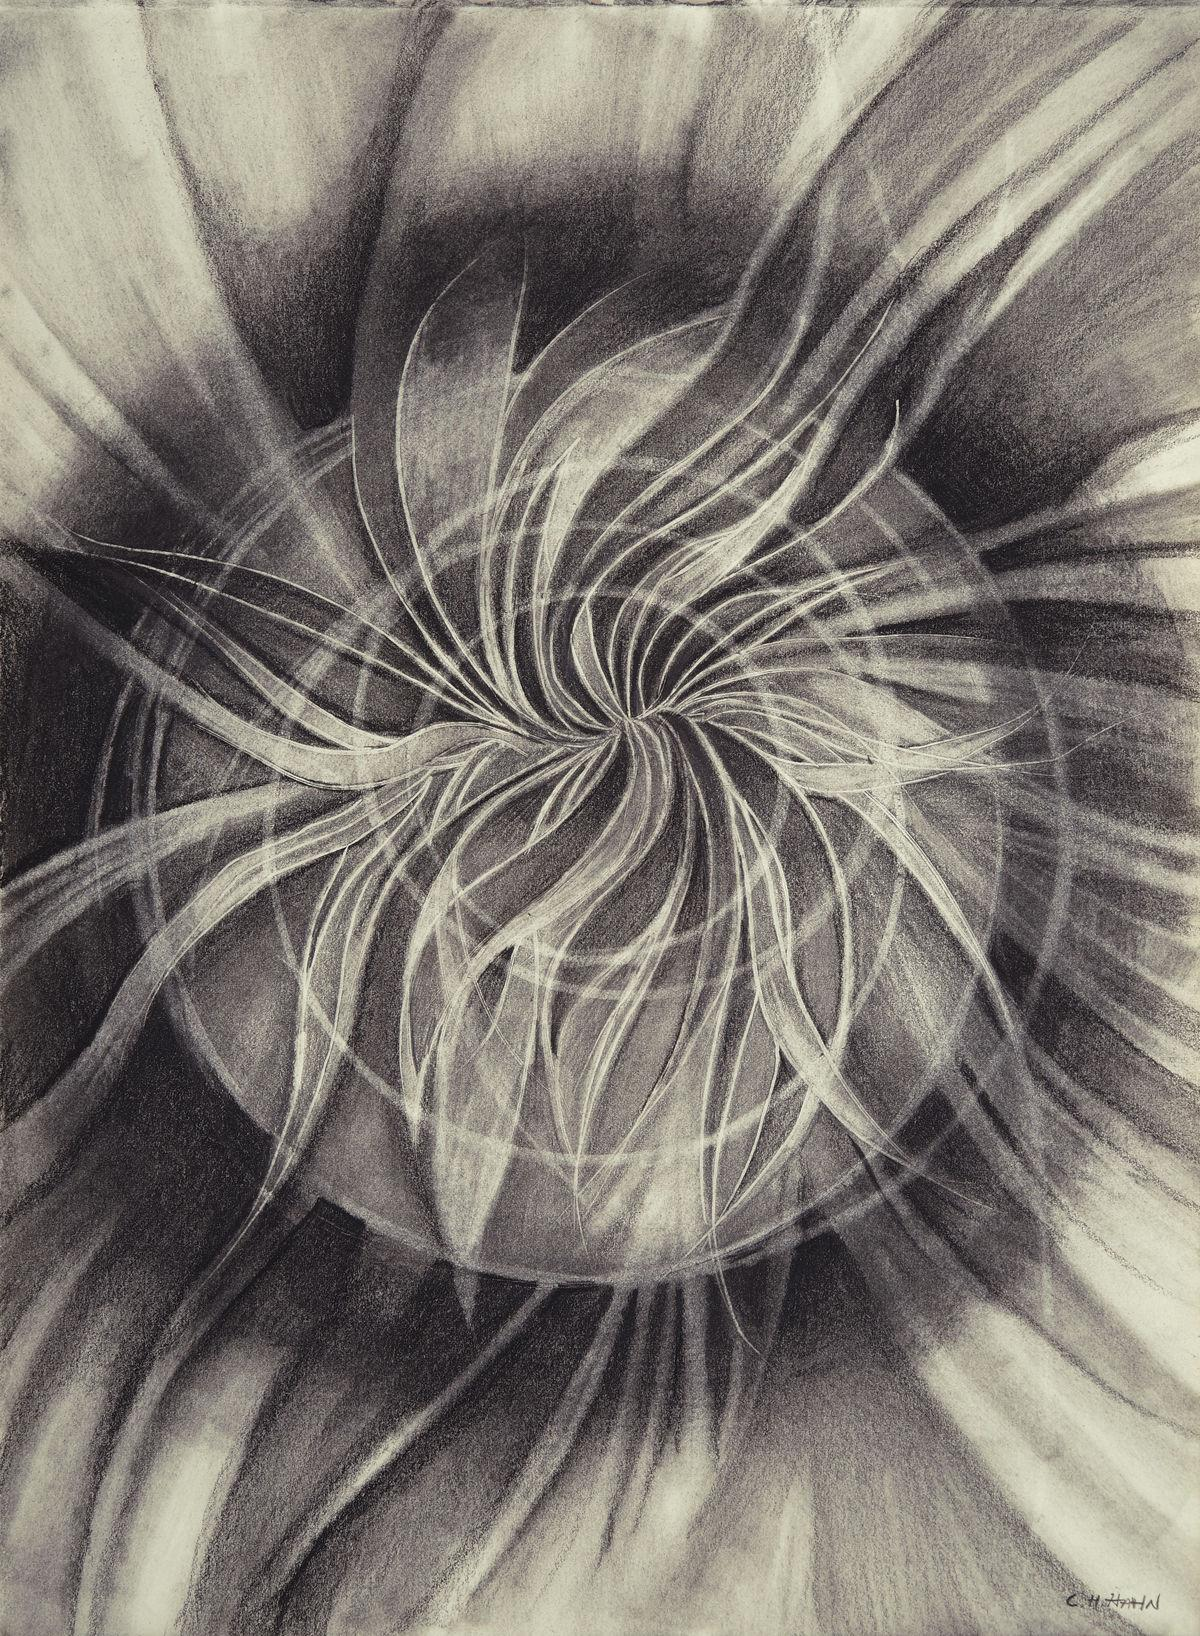 lynx - Channeling Blossom.jpg